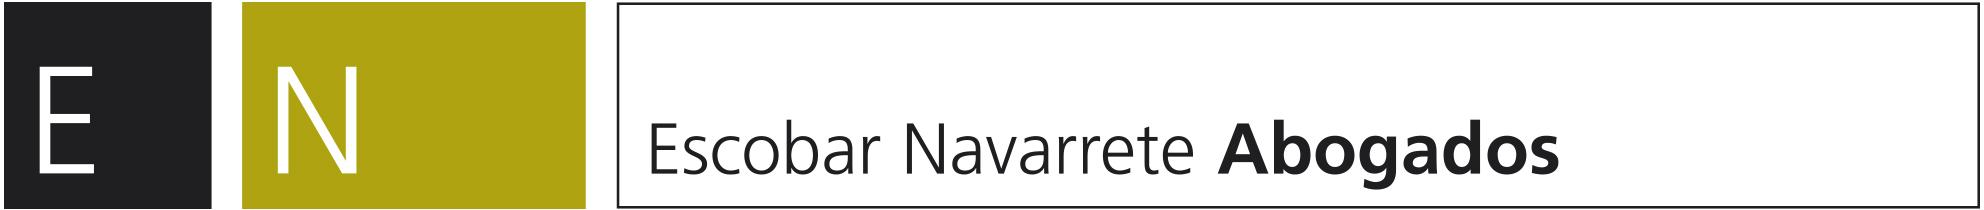 Escobar Navarrete Abogados